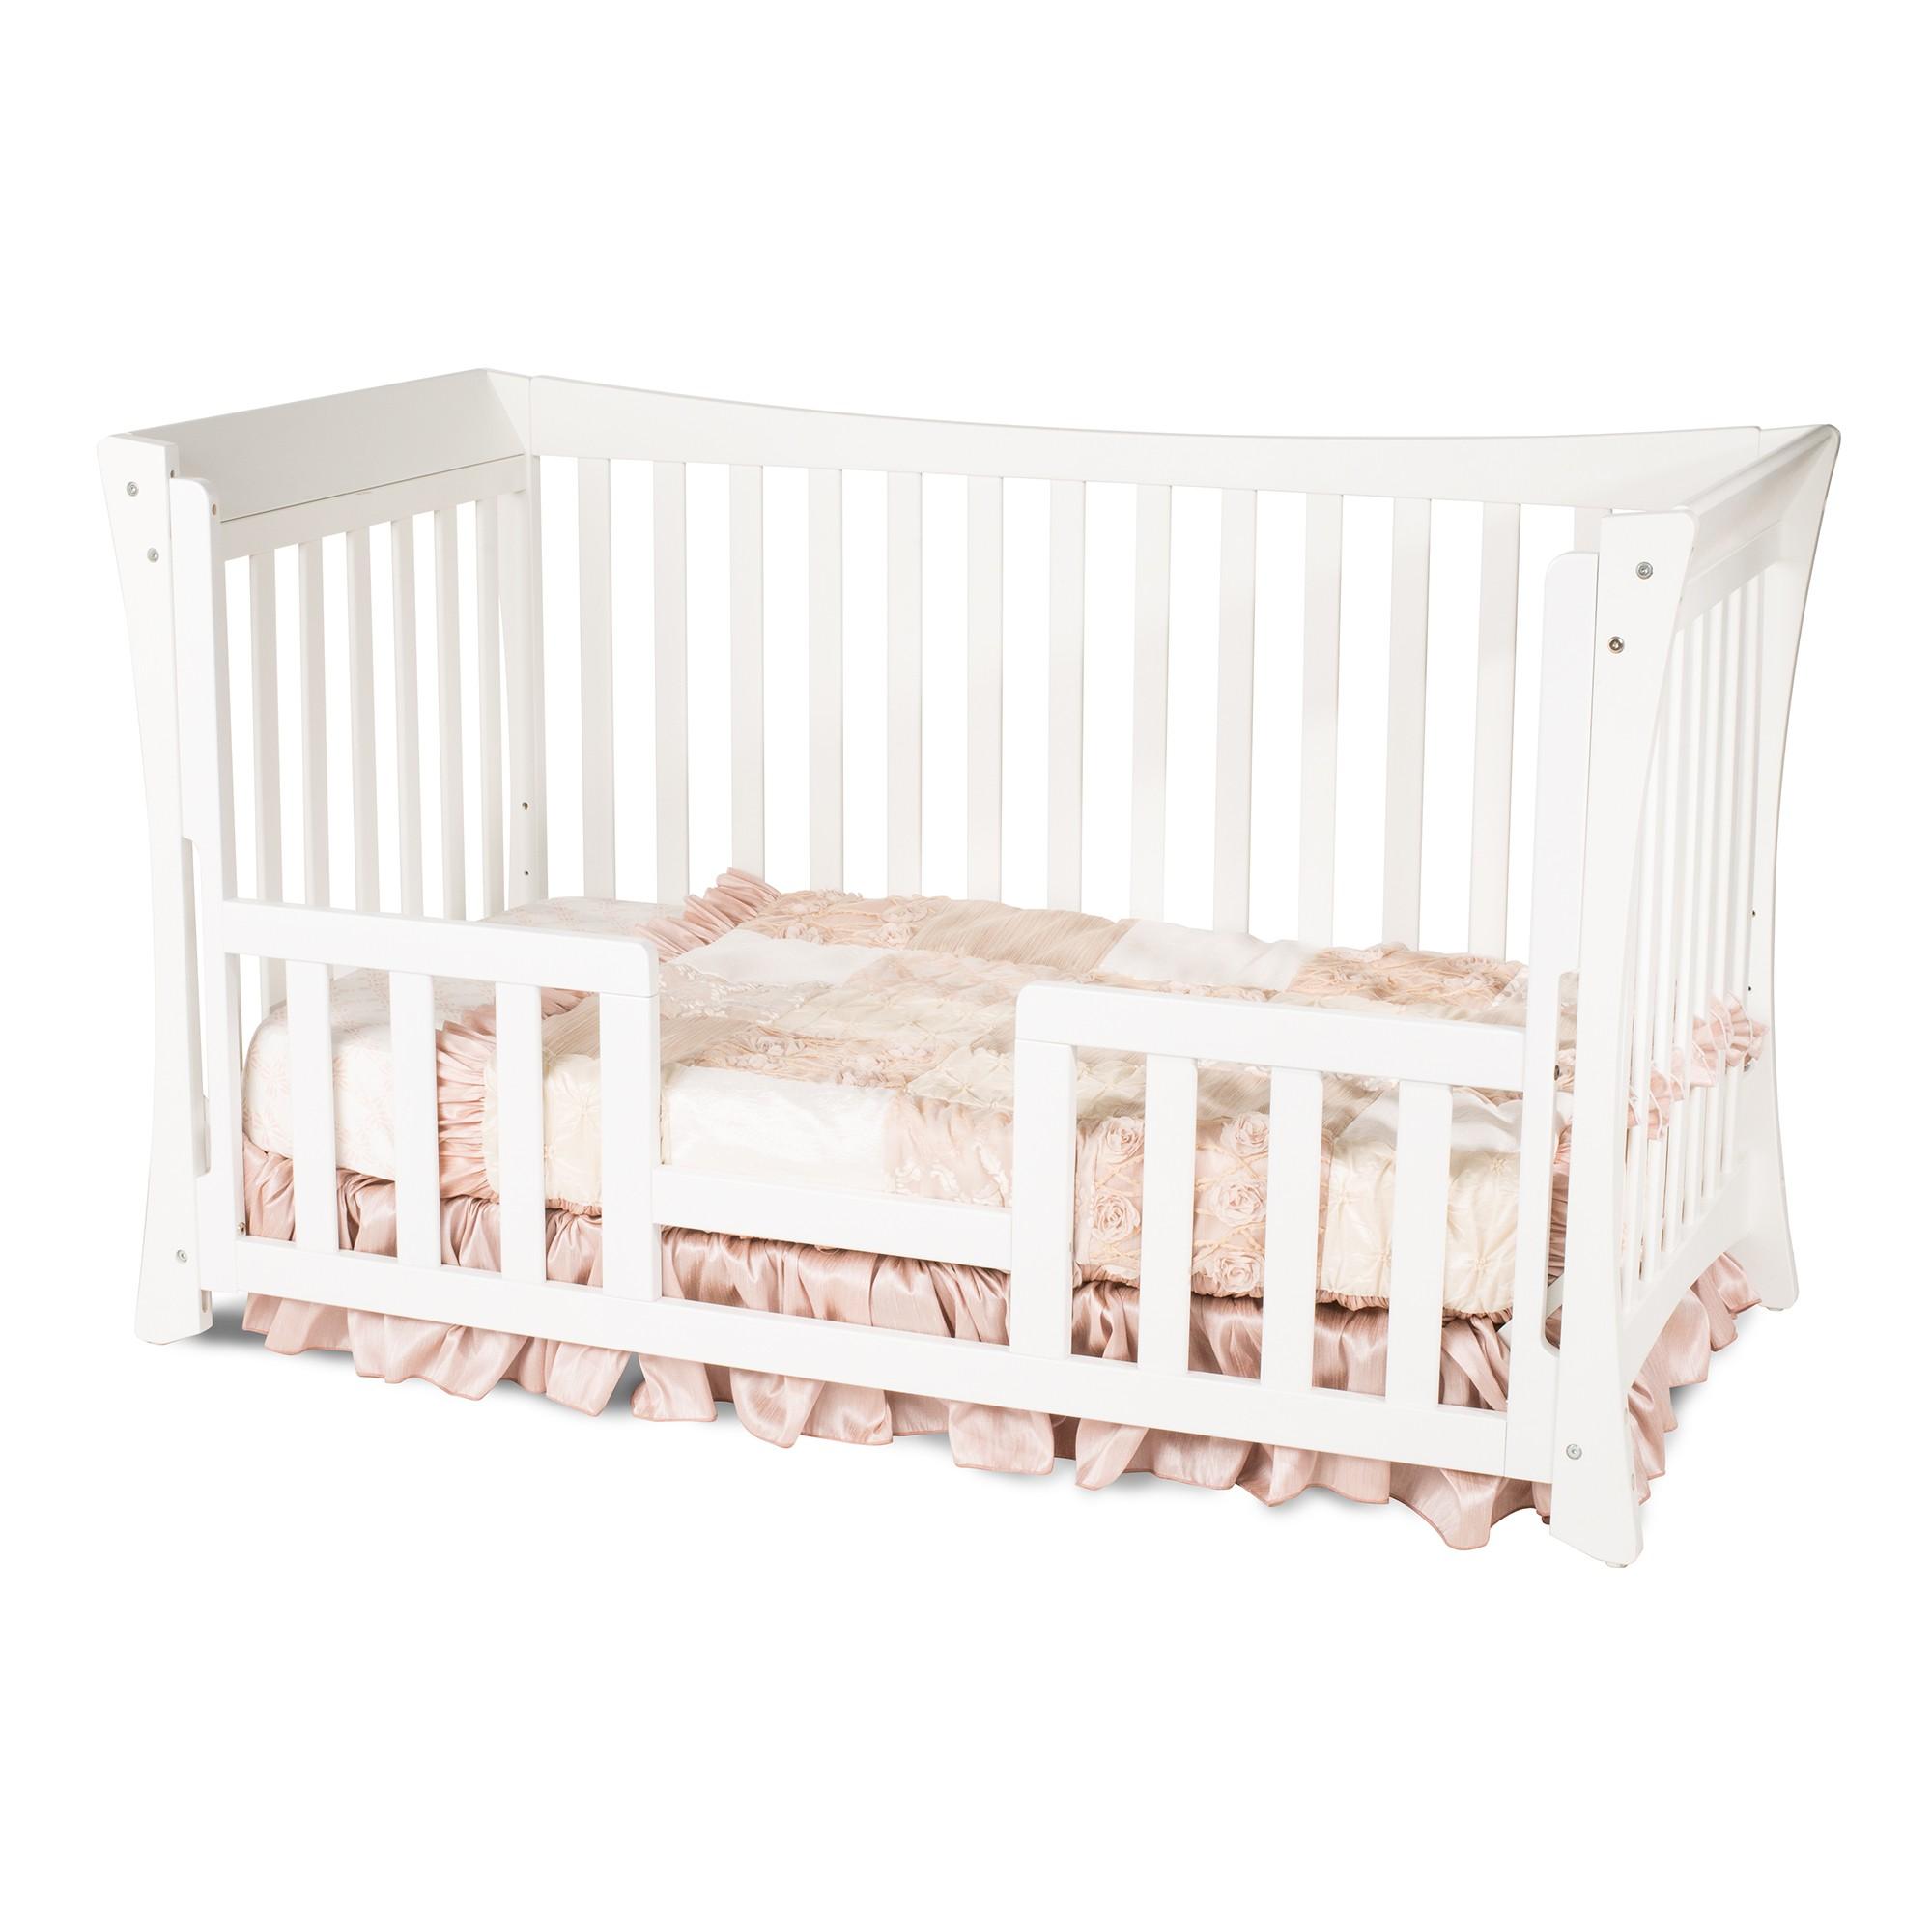 Child craft coventry crib -  Parisian Traditional Child Craft Crib Matte White Toddler Bed